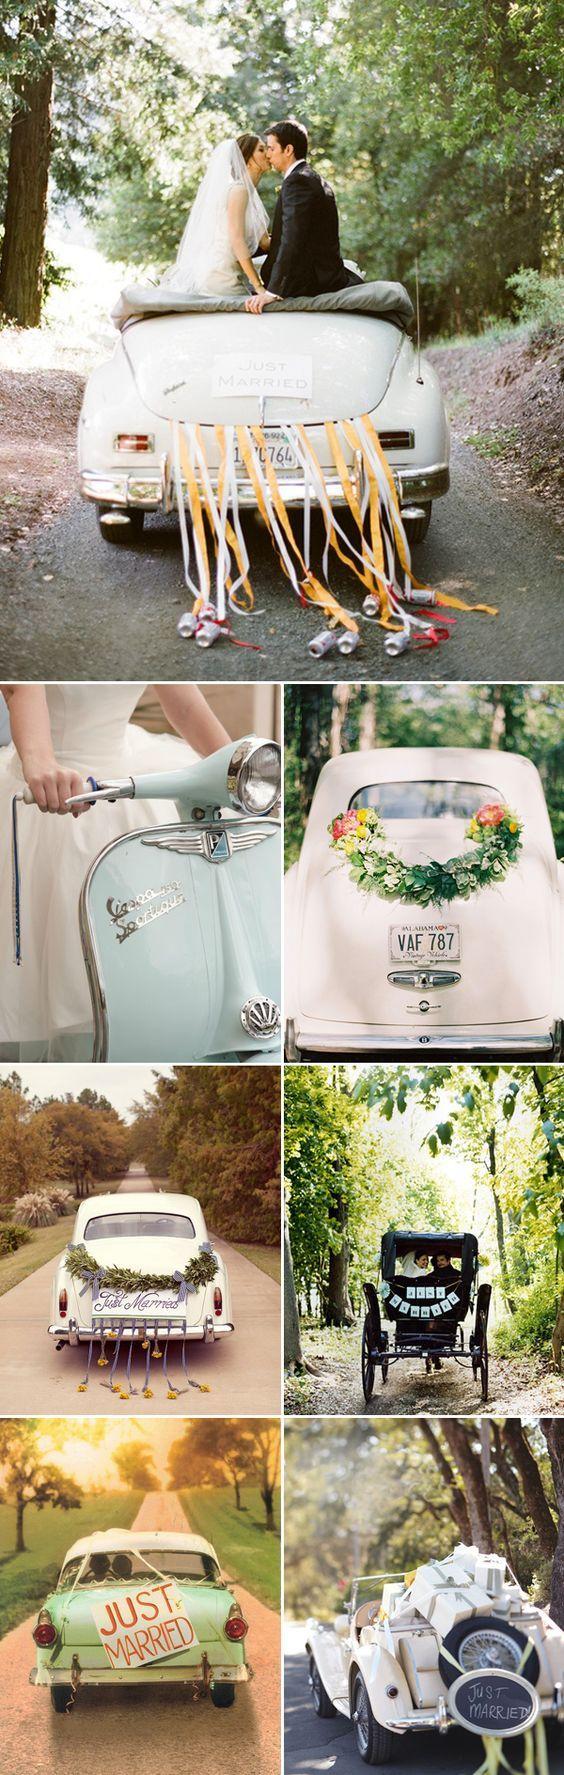 vintage wedding getaway cars / http://www.himisspuff.com/ways-to-decorate-your-wedding-getaway-car/6/